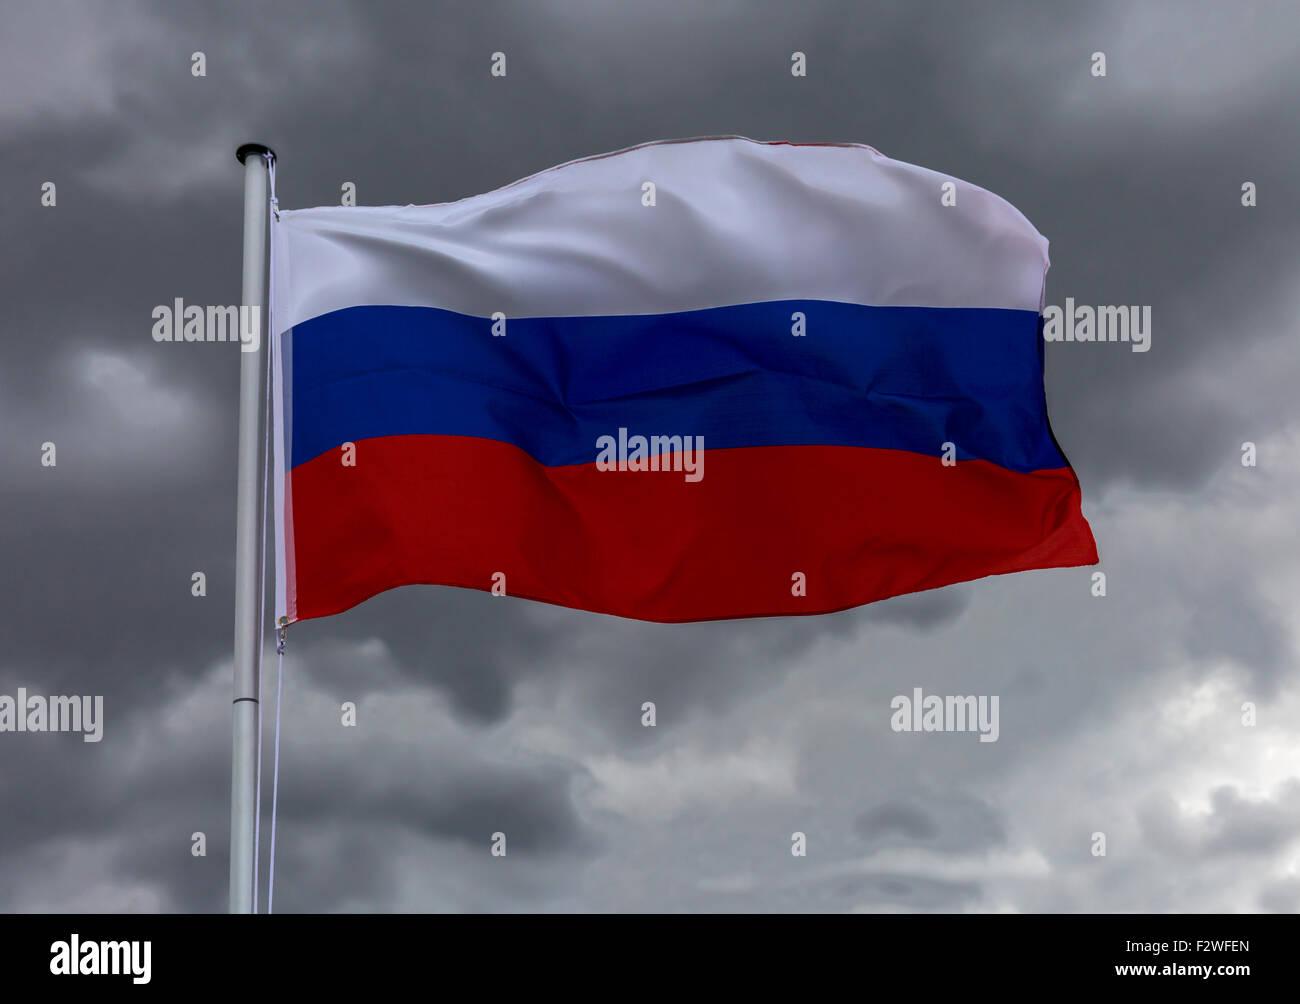 18.04.2015, Berlin, Berlin, Germany - Flag of Russian Federation waving in the wind. 0MK150416D031CAROEX.JPG - NOT - Stock Image